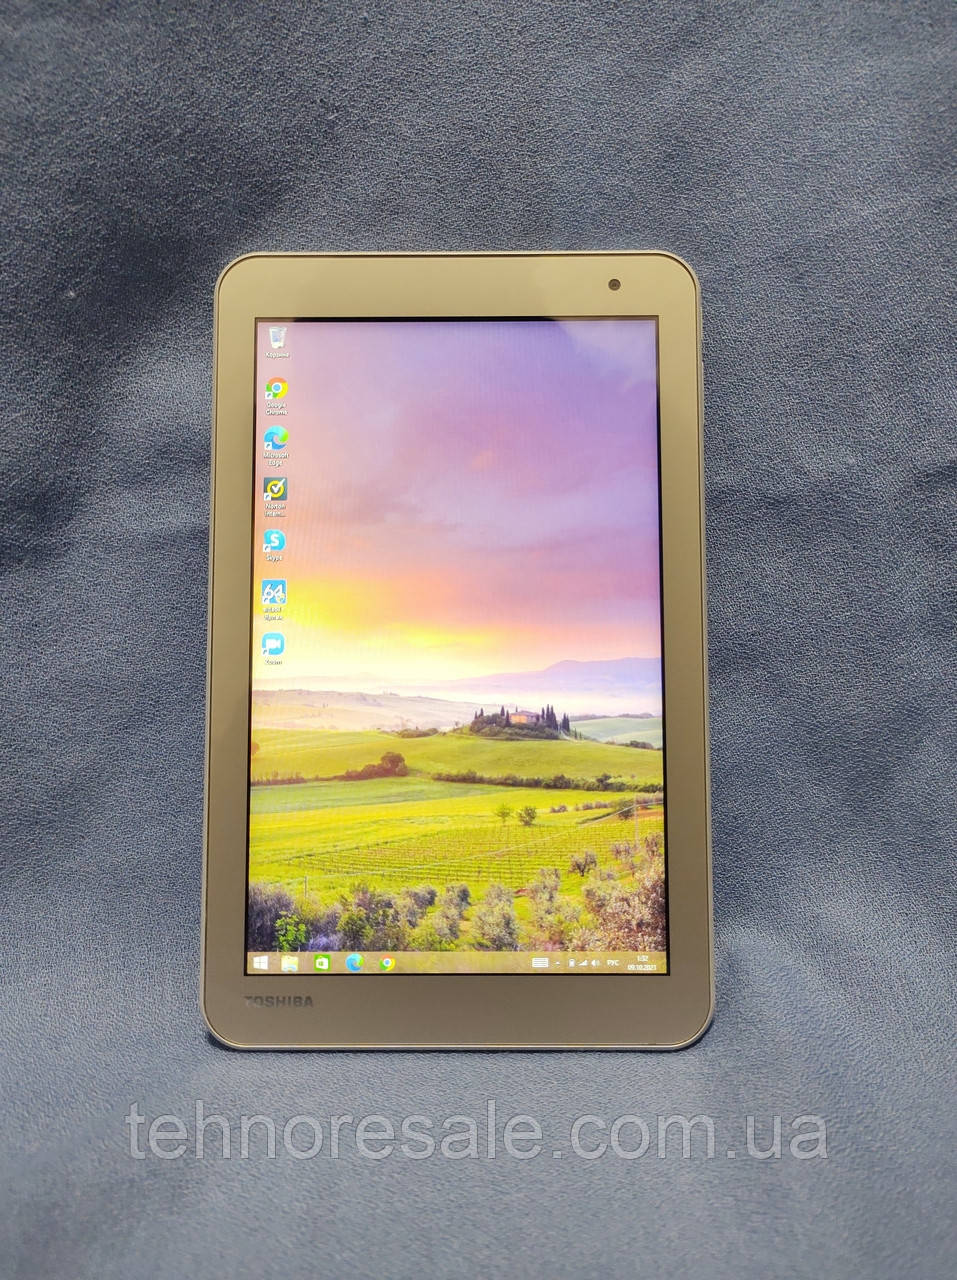 "Планшет Toshiba Encore 2 WT8-B32CN, 8"", 4 ядра, 2Gb/32+64Gb, Windows, WI-FI+Bluetooth, GPS"